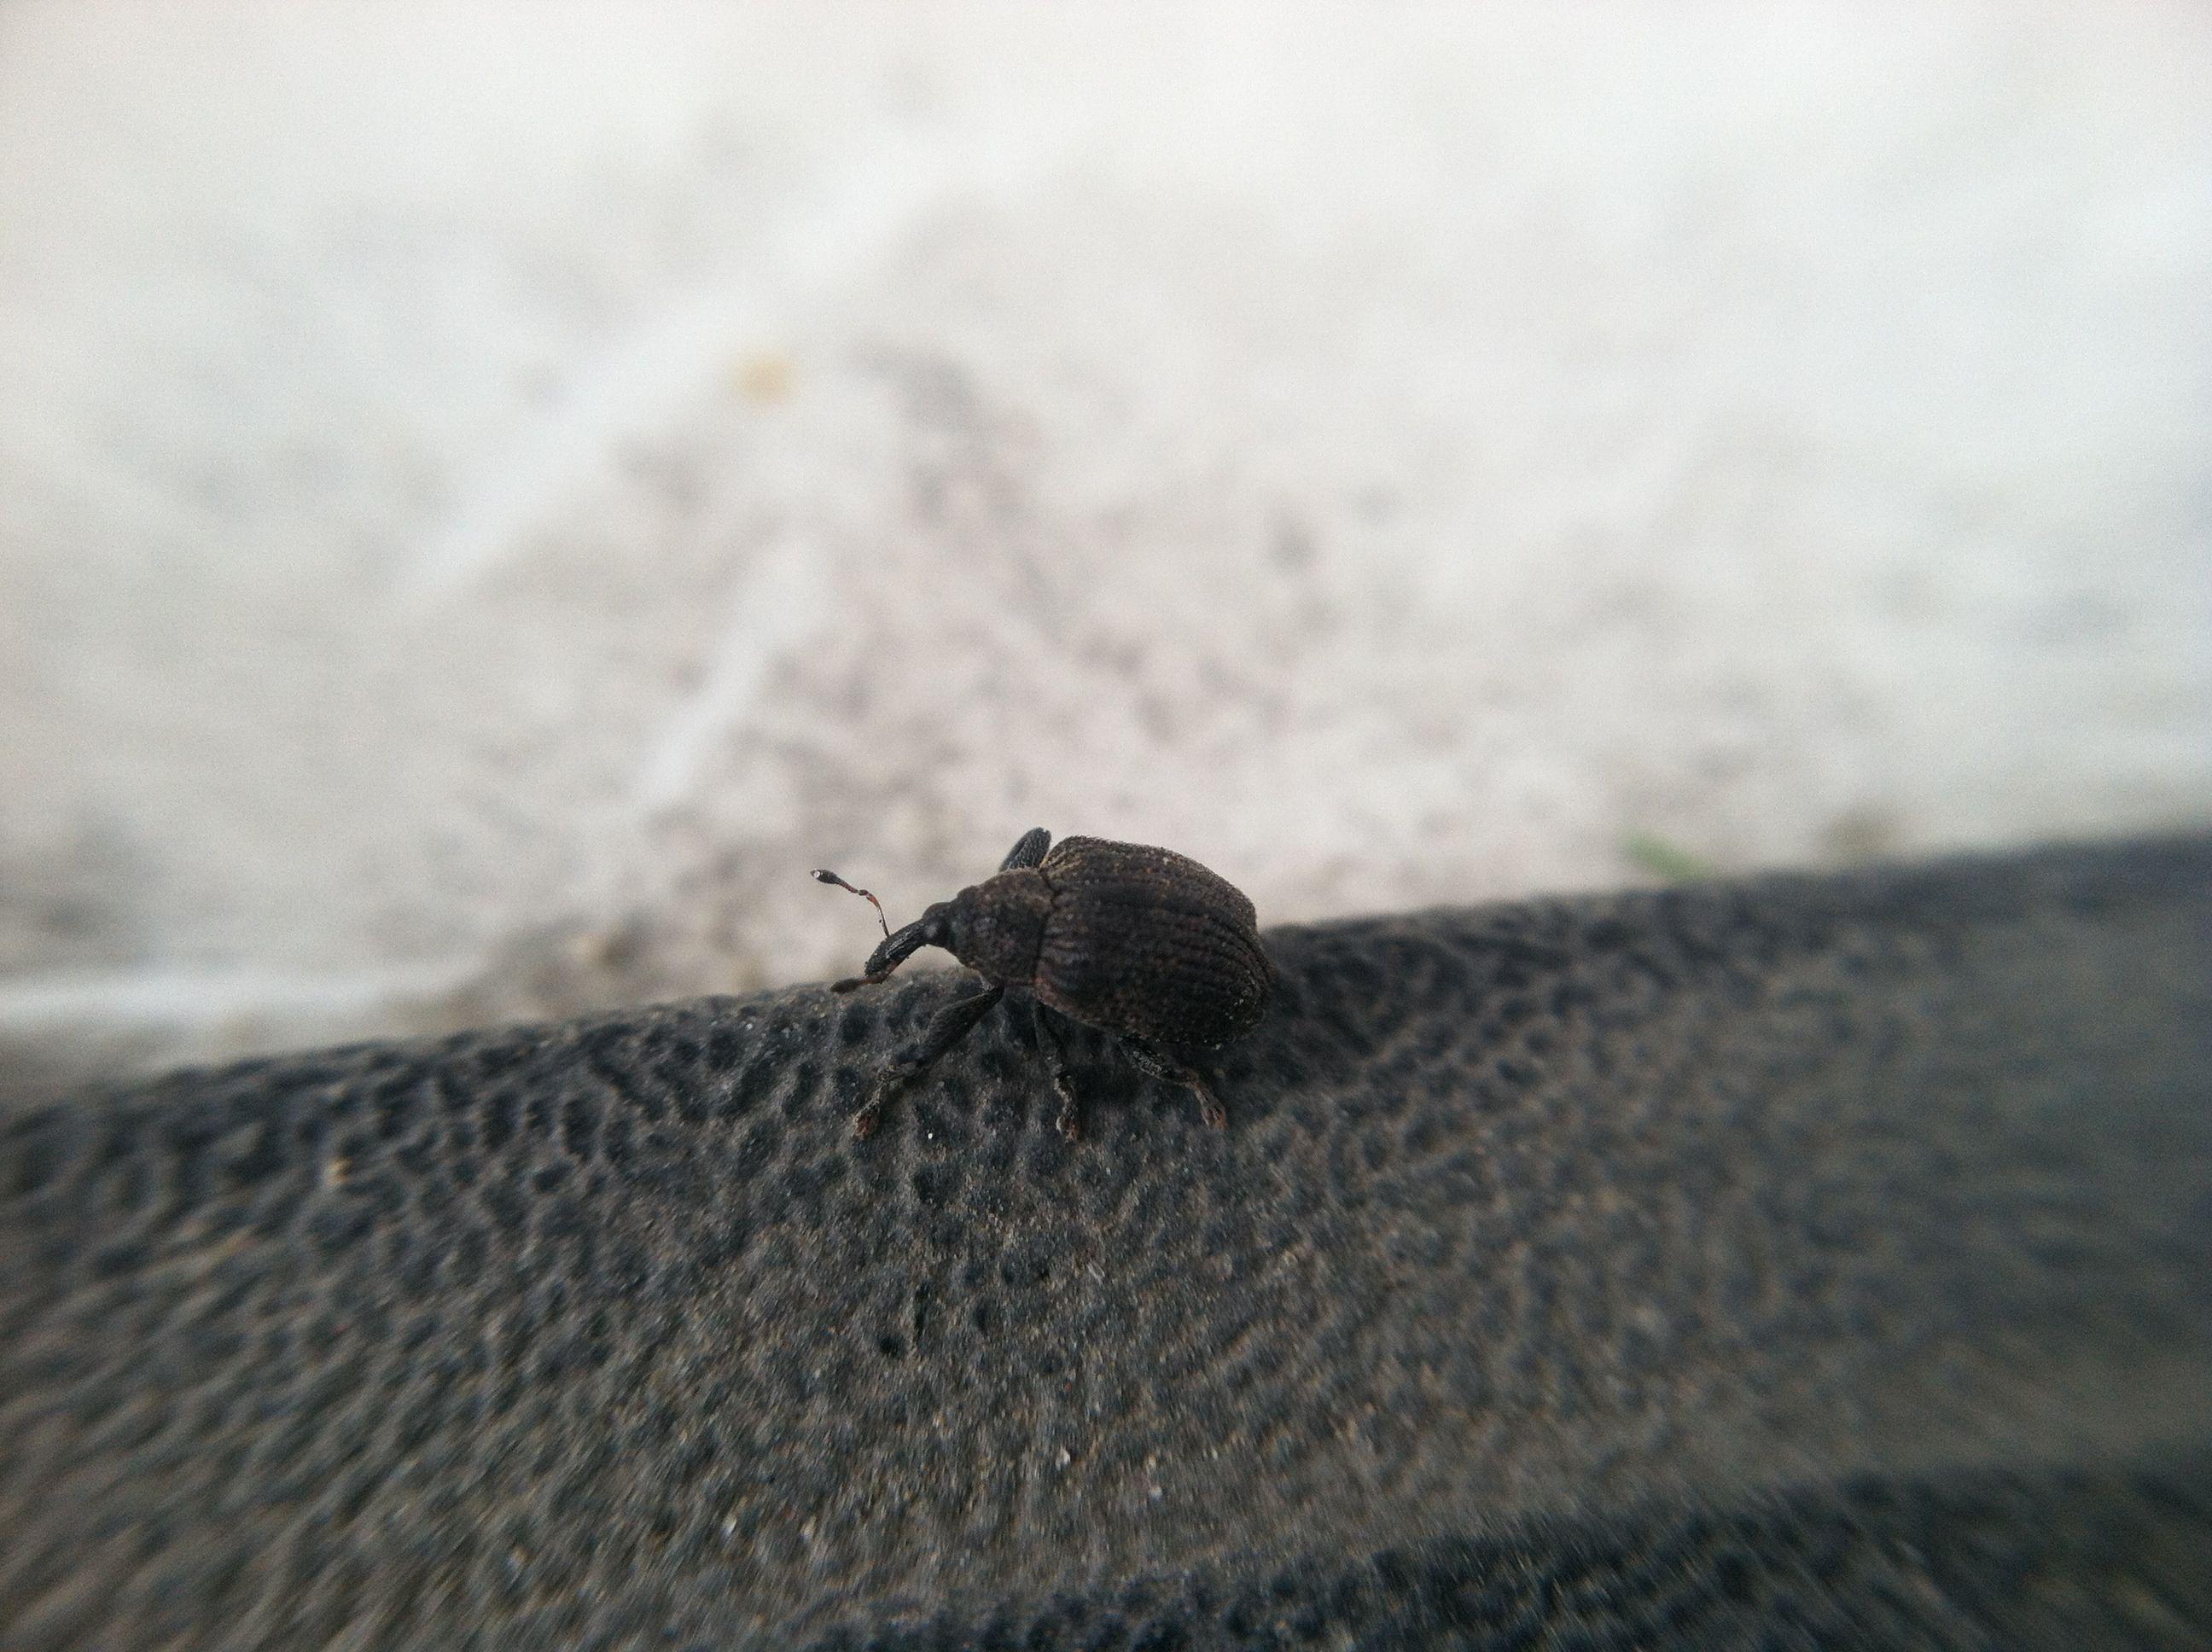 Order Coleoptera Family Curculionidae weevil, herbivore, harmless